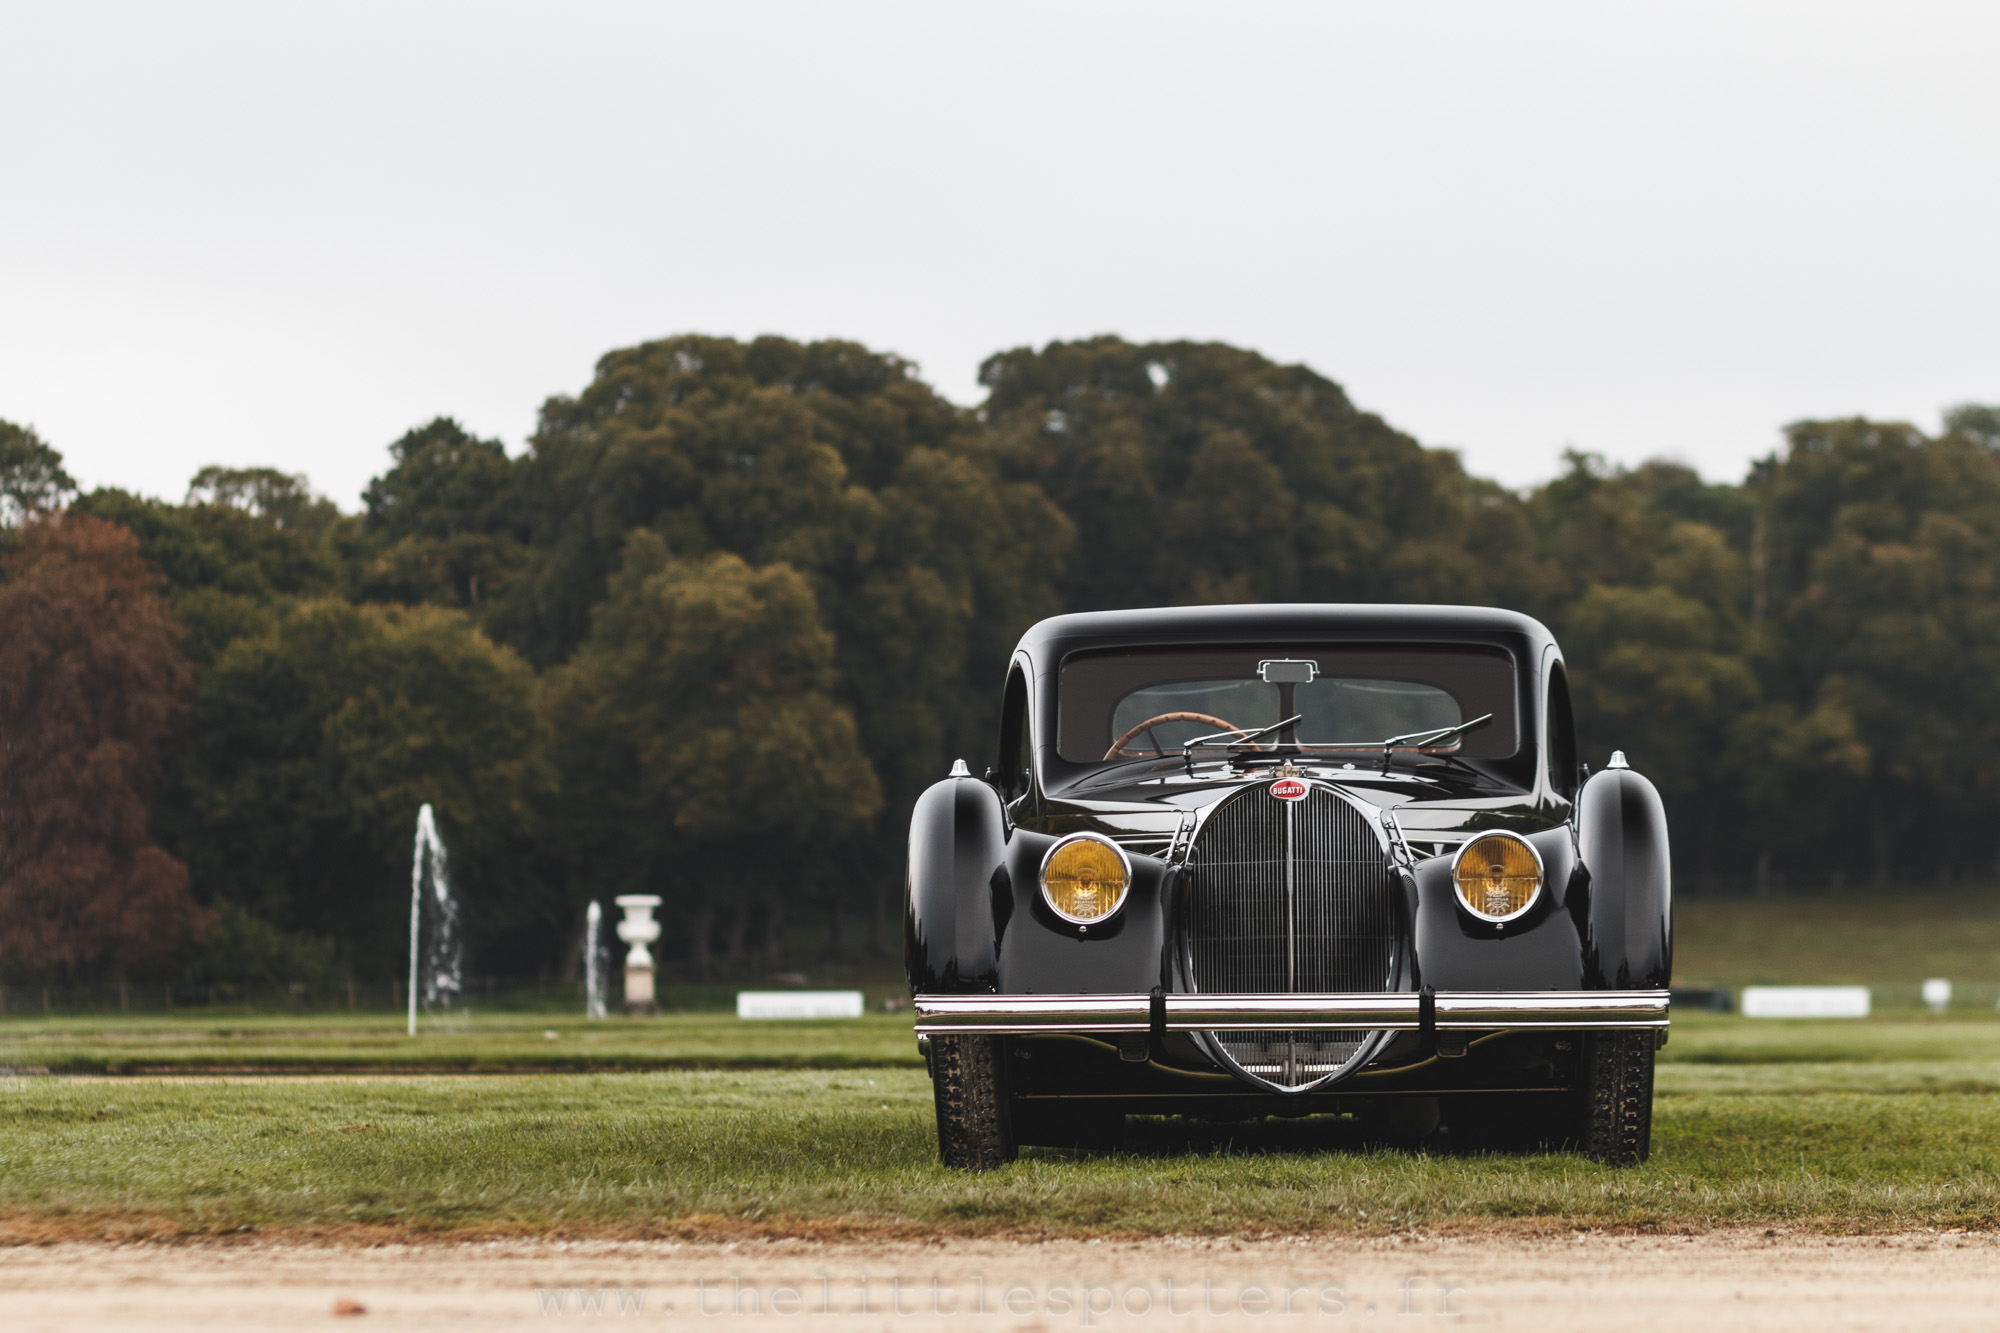 Bugatti Type 57 S Atalante Gangloff #57532 – 1937